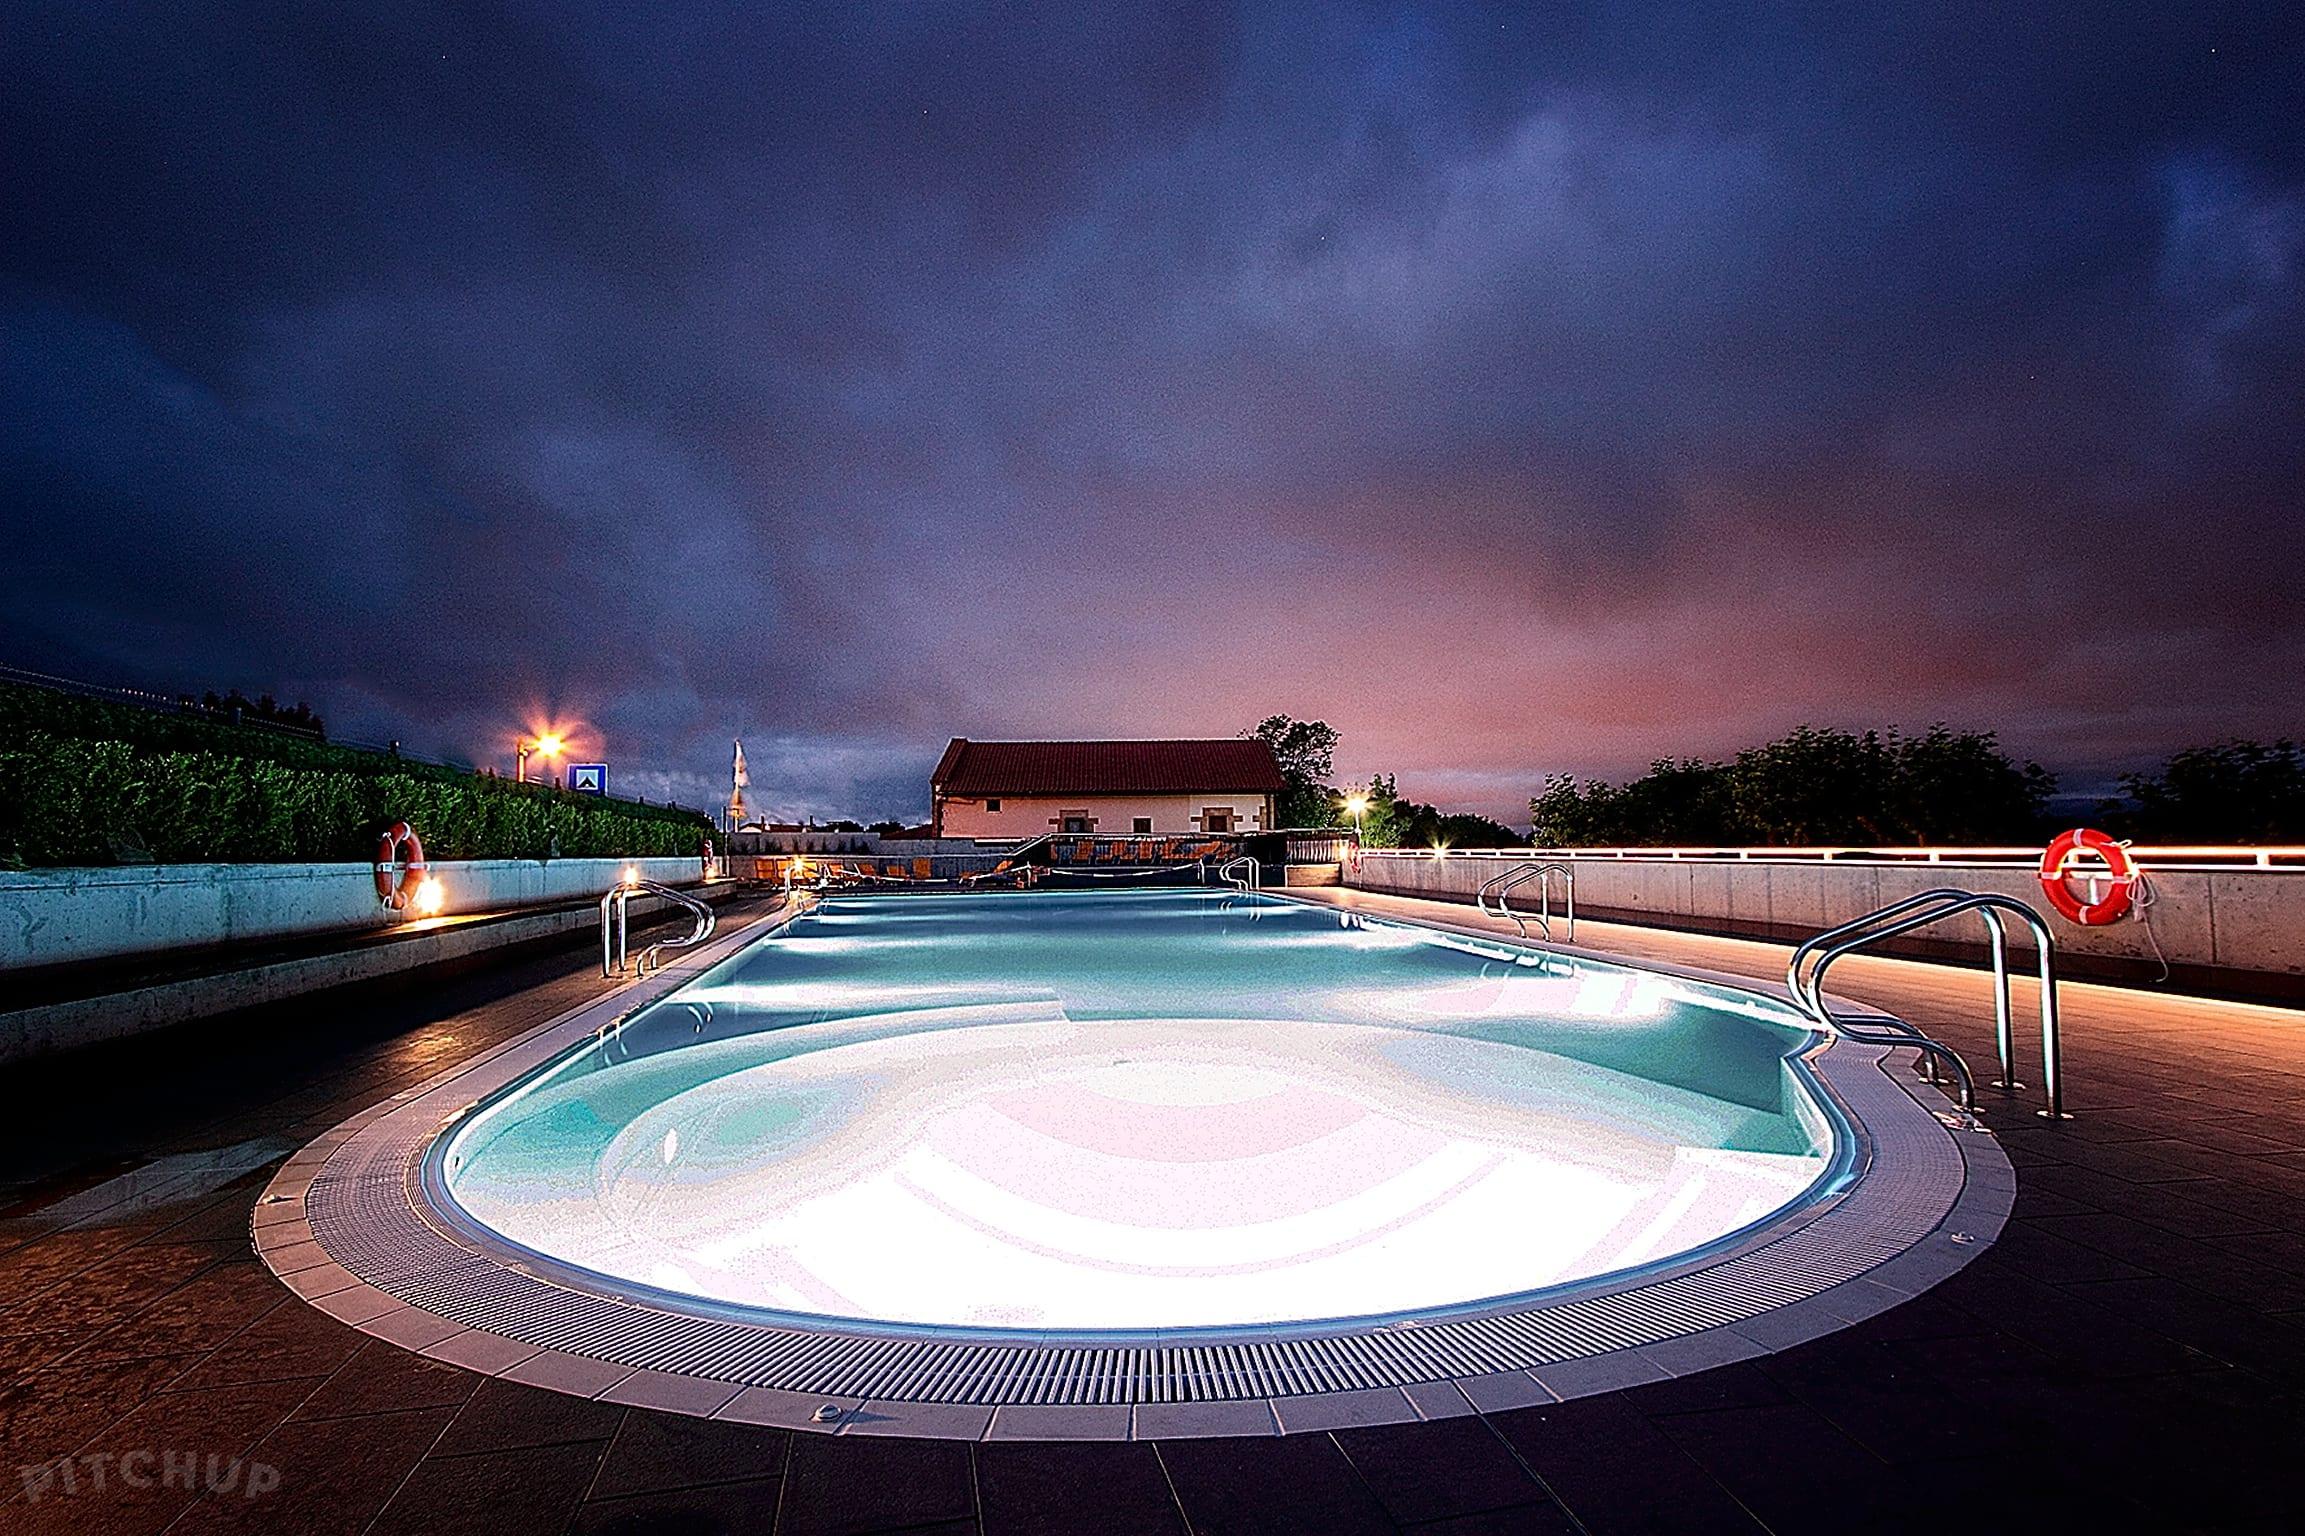 Camping Igueldo, San Sebastián - Tarifs 2020 - Pitchup® pour Camping Pays Basque Avec Piscine